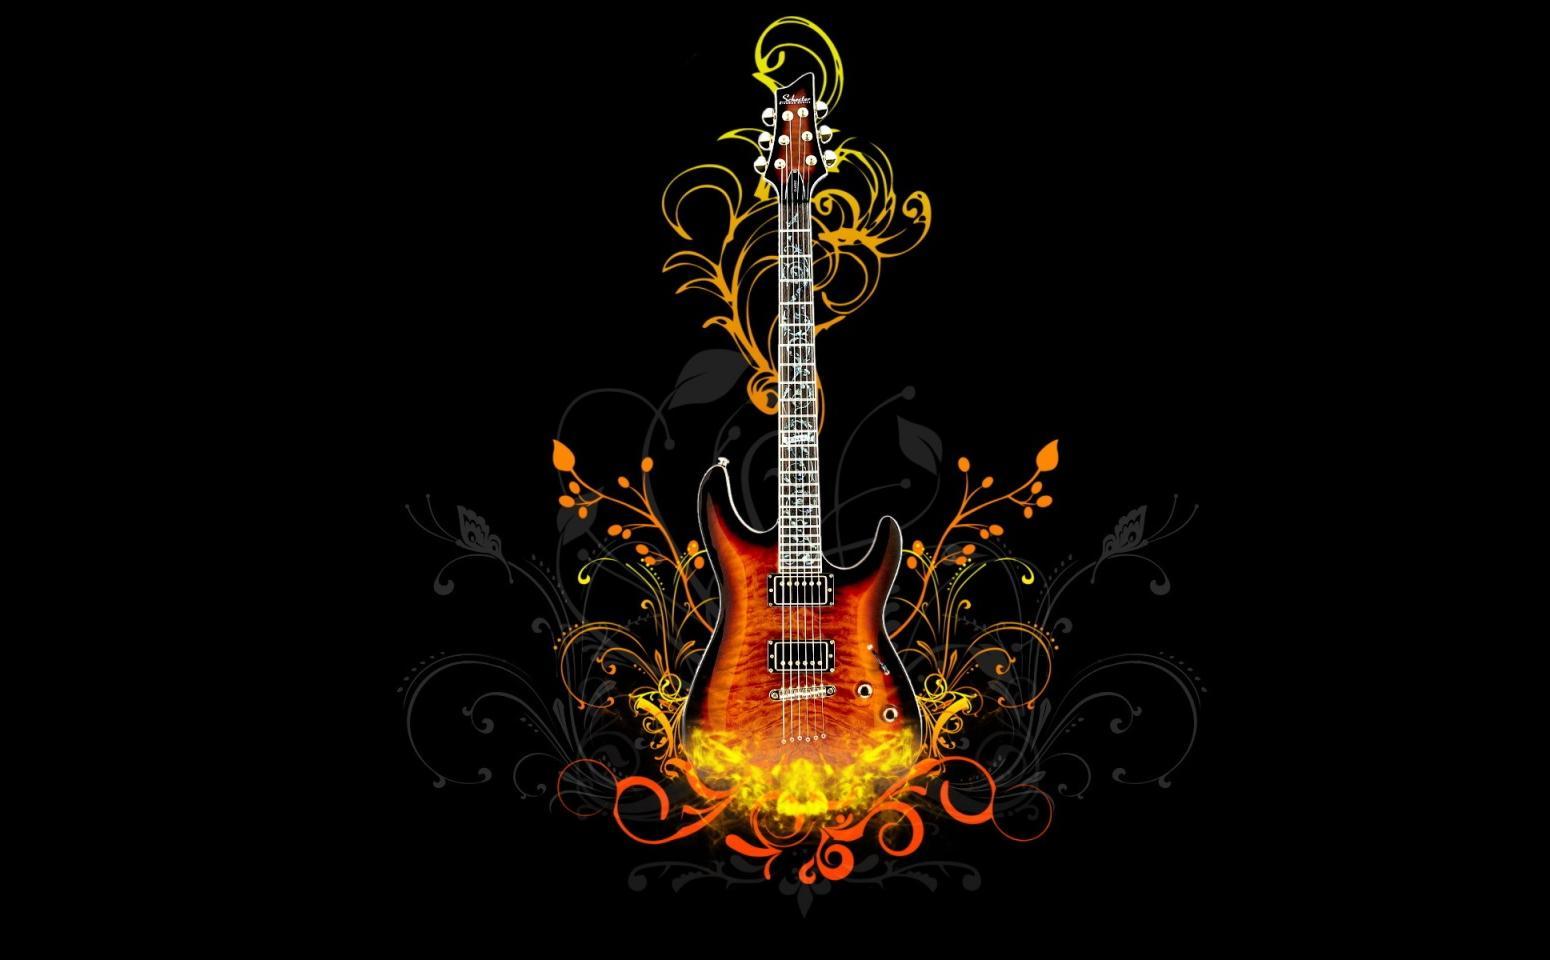 http://2.bp.blogspot.com/-6Akj1PJG8z8/T6LIIZWQIwI/AAAAAAAADYk/er-TedGmoQU/s1600/Guitar_and_ribbons_1280x960%2Bhd%2Bwallpaper.JPG